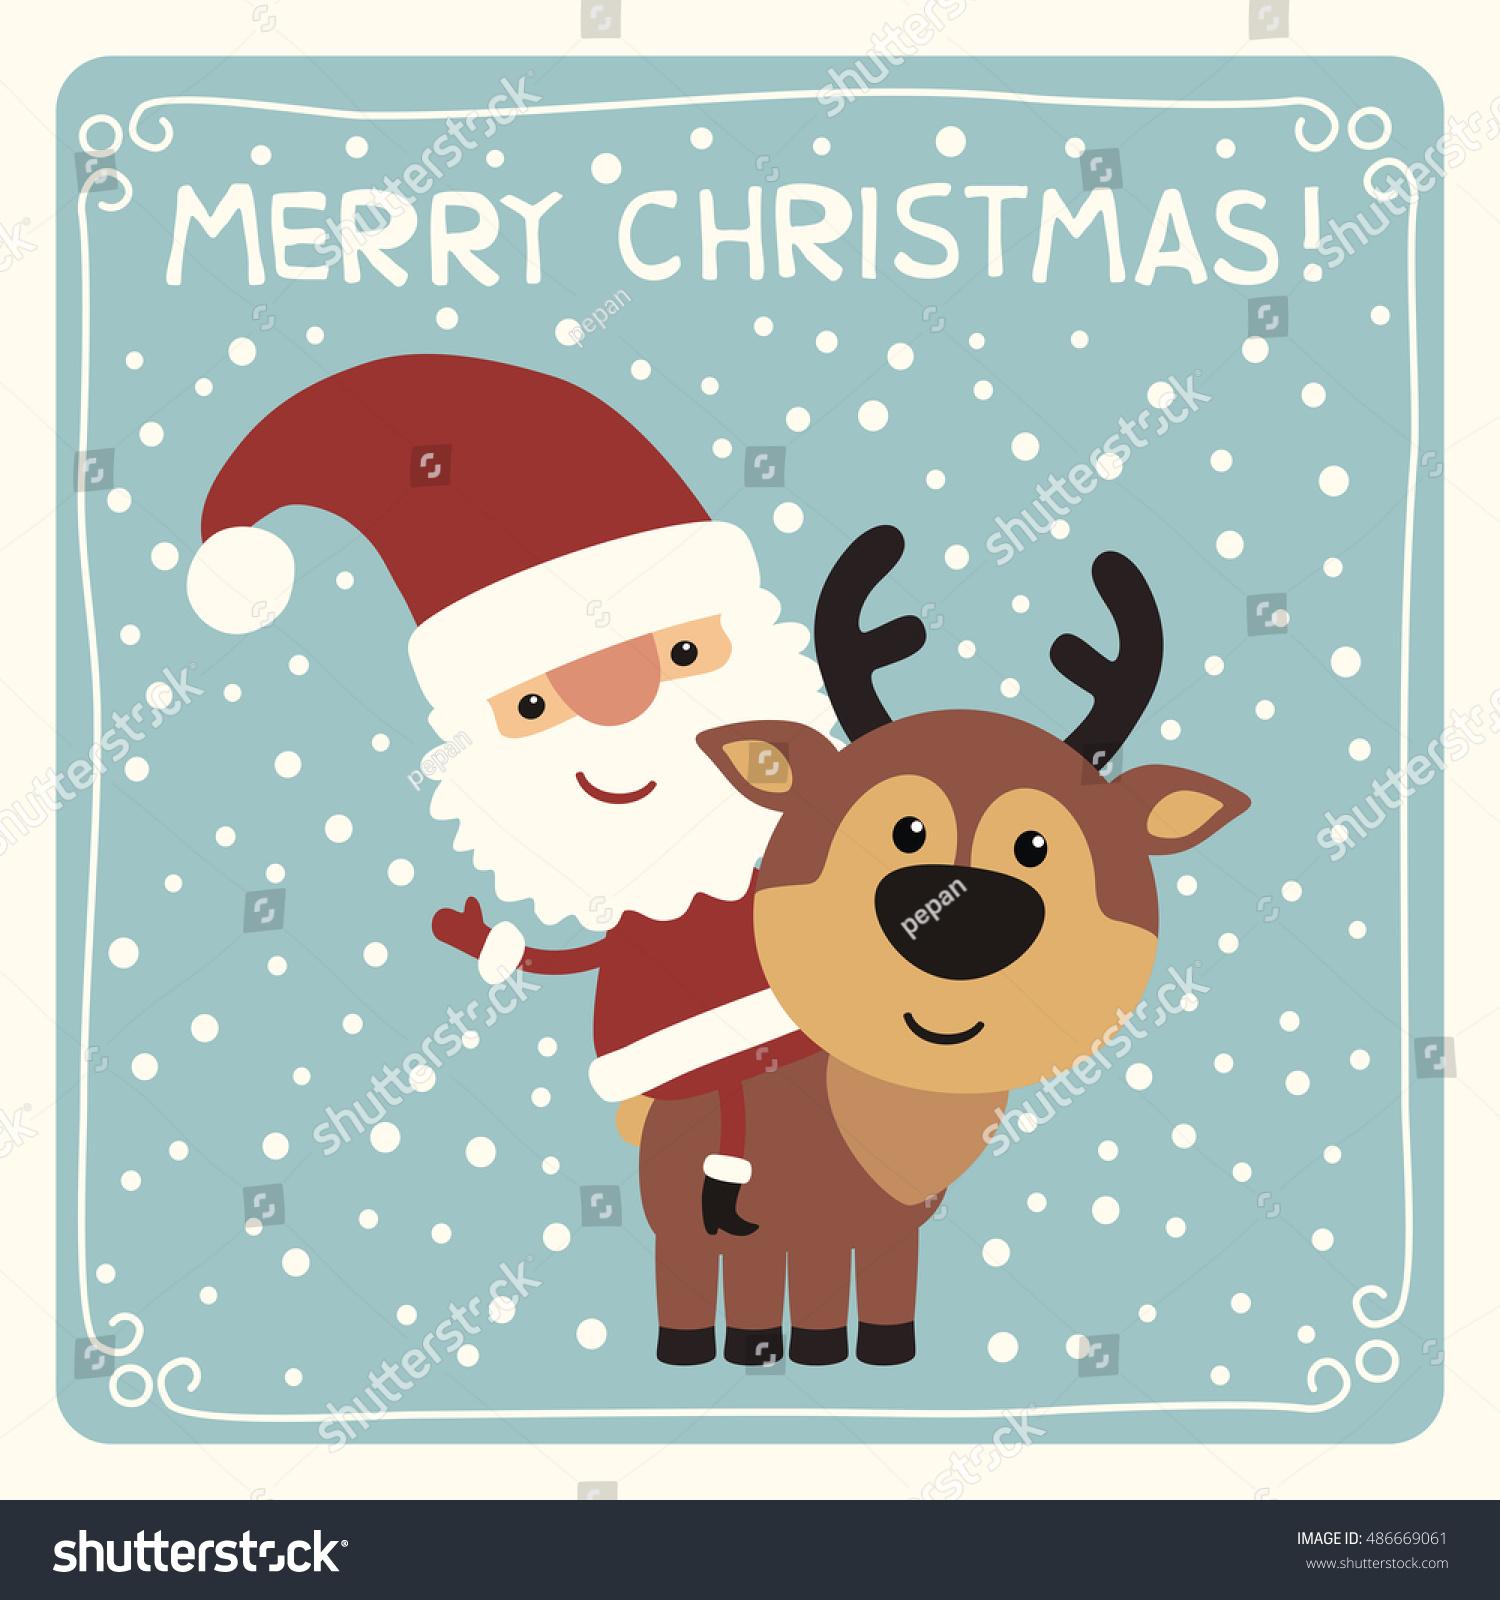 Merry Christmas Funny Santa Claus Riding Stock Vector (Royalty Free ...